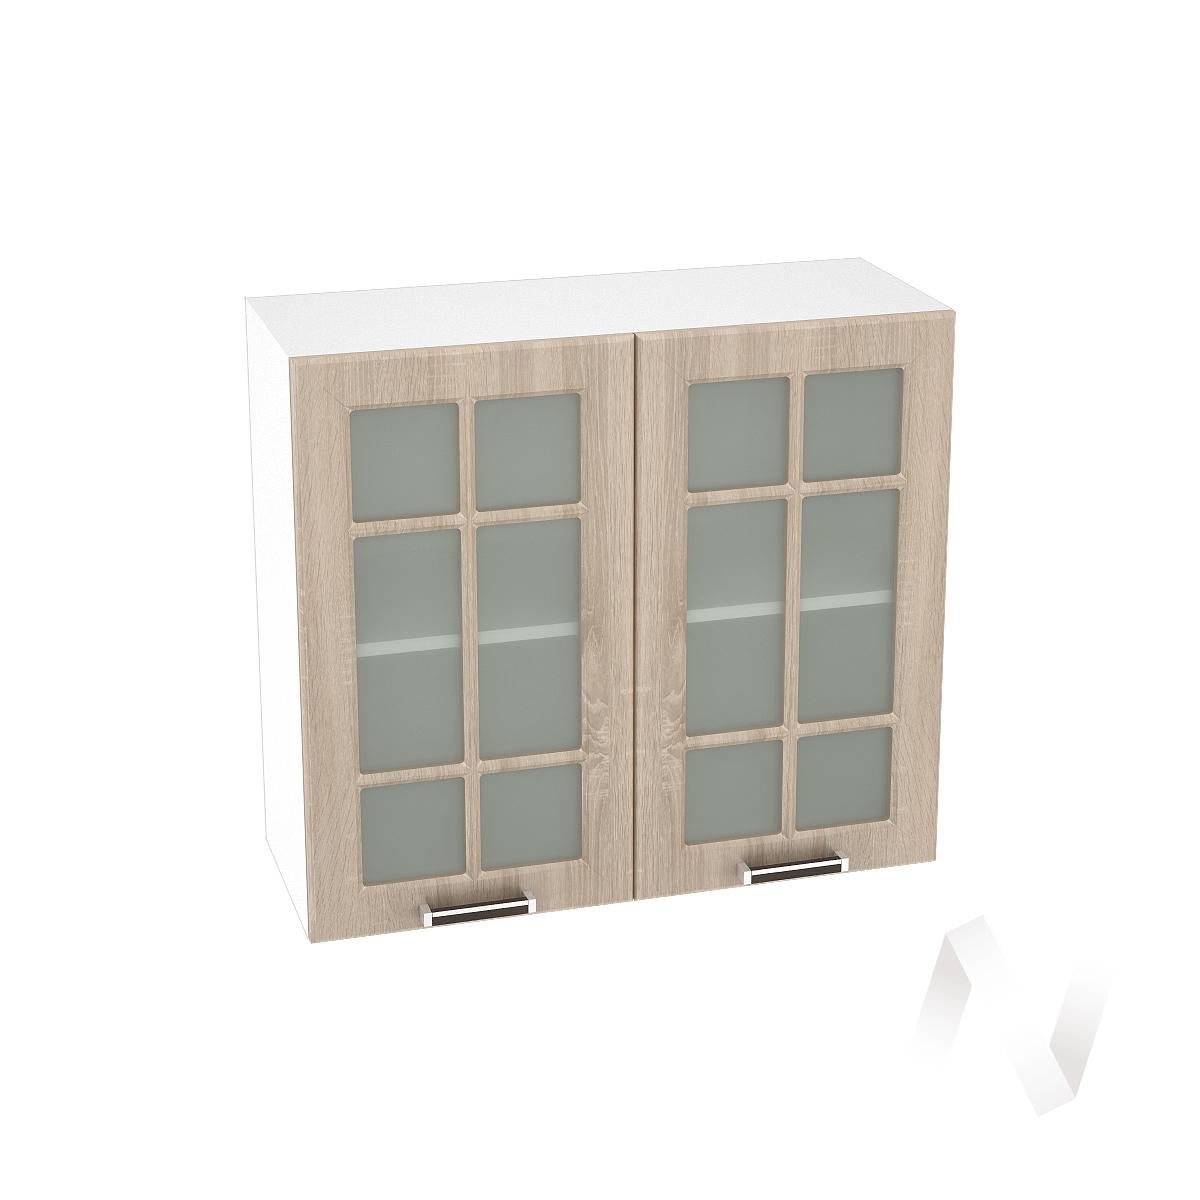 "Кухня ""Прага"": Шкаф верхний со стеклом 800, ШВС 800 (дуб сонома/корпус белый)"